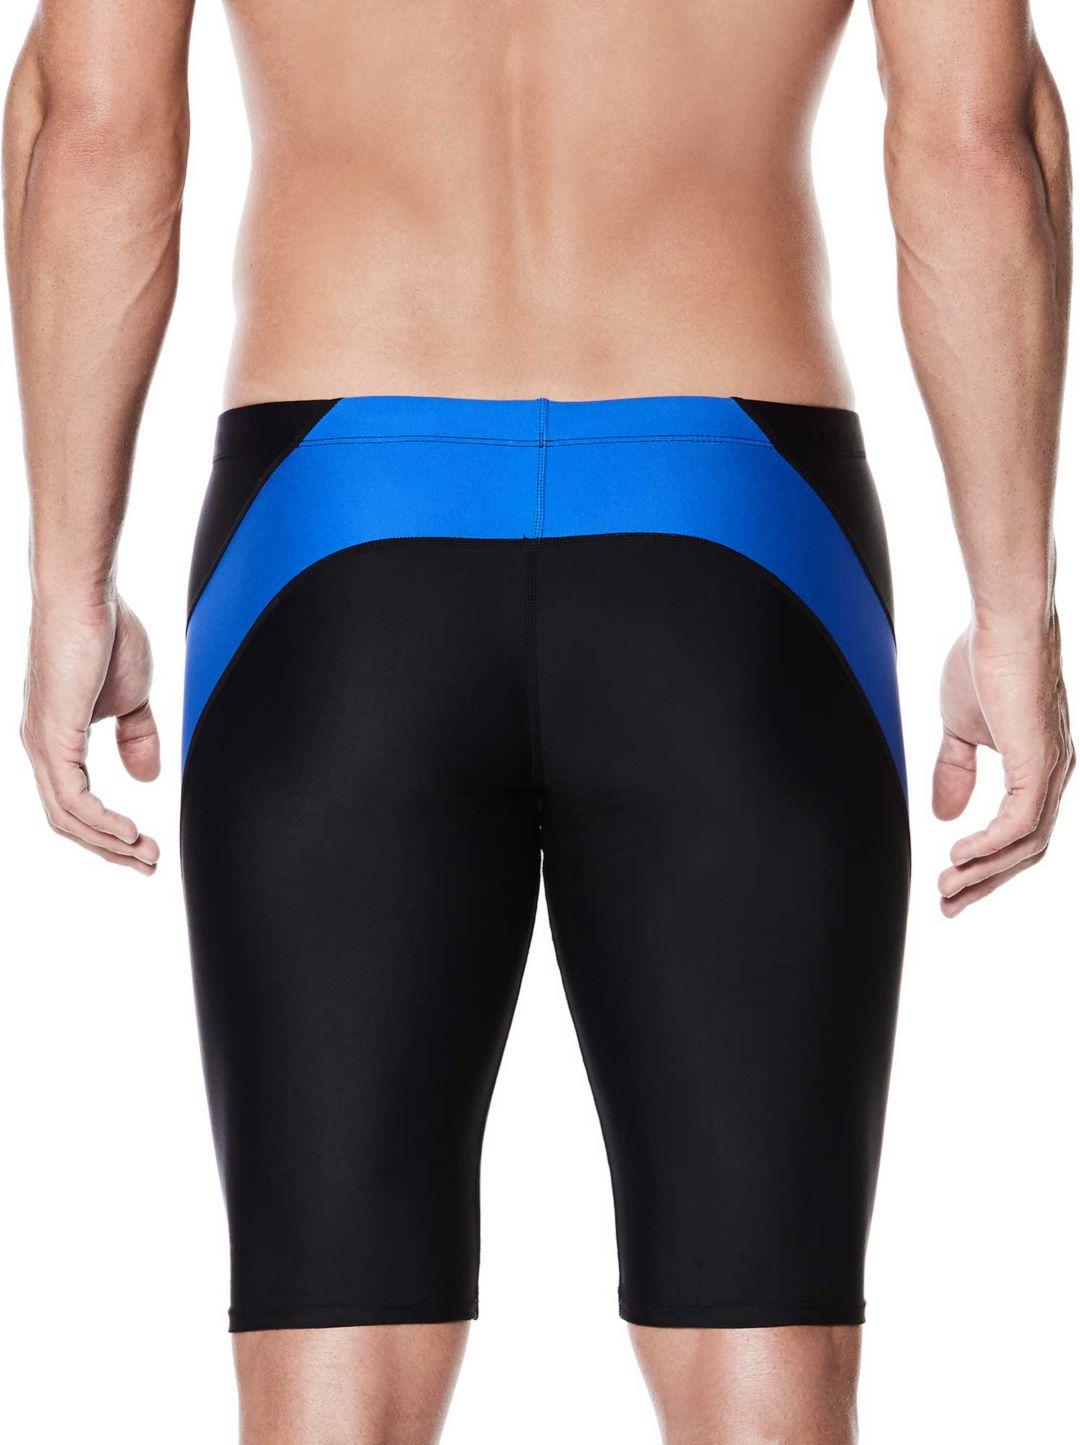 84caa8b2b4 Nike Men's Victory Color Block Jammer | DICK'S Sporting Goods